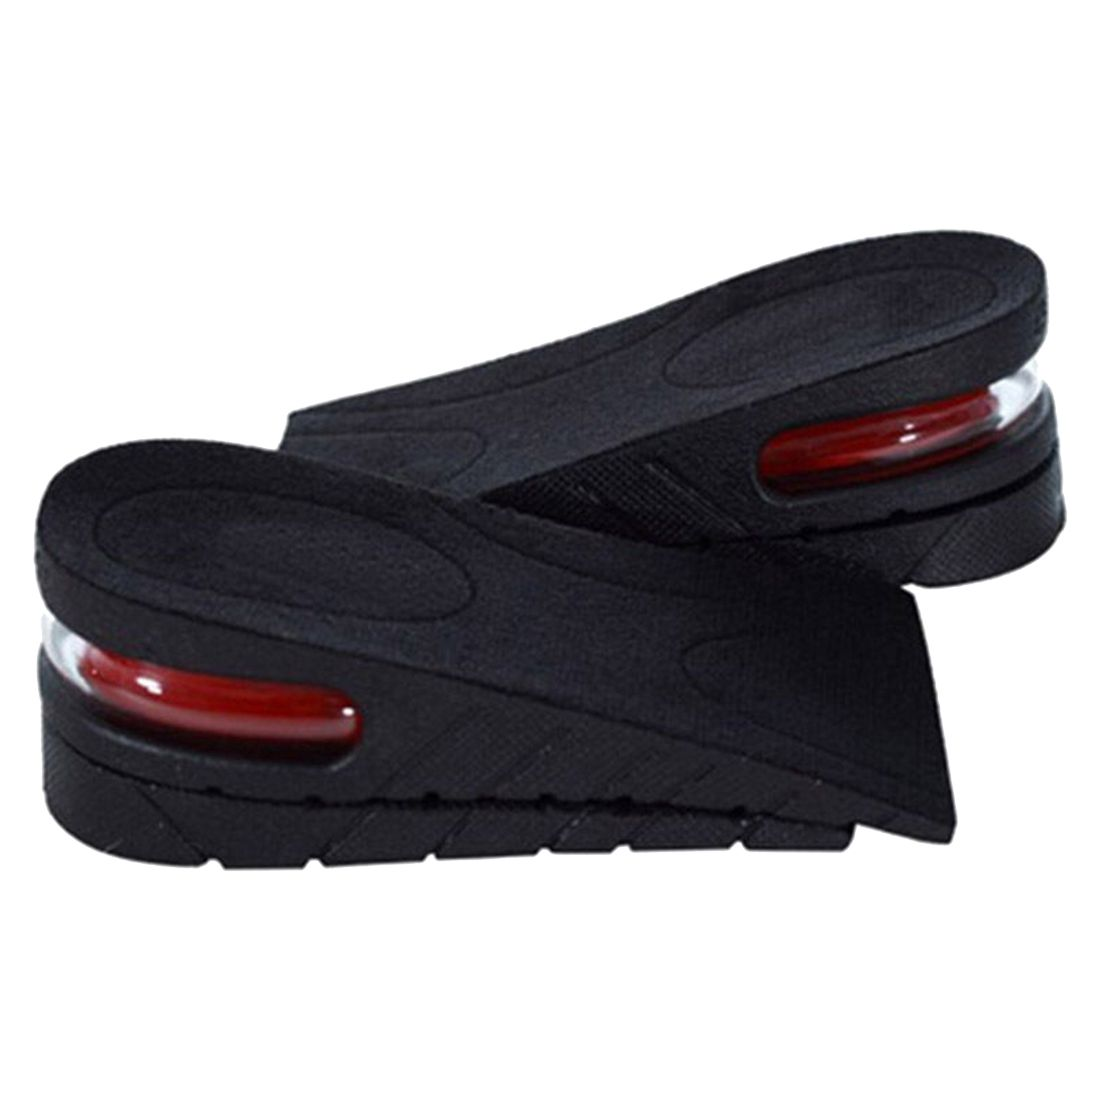 Fashion Boutique Men Women Shoe Insole Air Cushion Heel insert Increase Tall Height Lift 5cm men women shoe insole air cushion adjustable heel insert increase lift heel inserts higher shoes pads layer taller 5cm 2inch